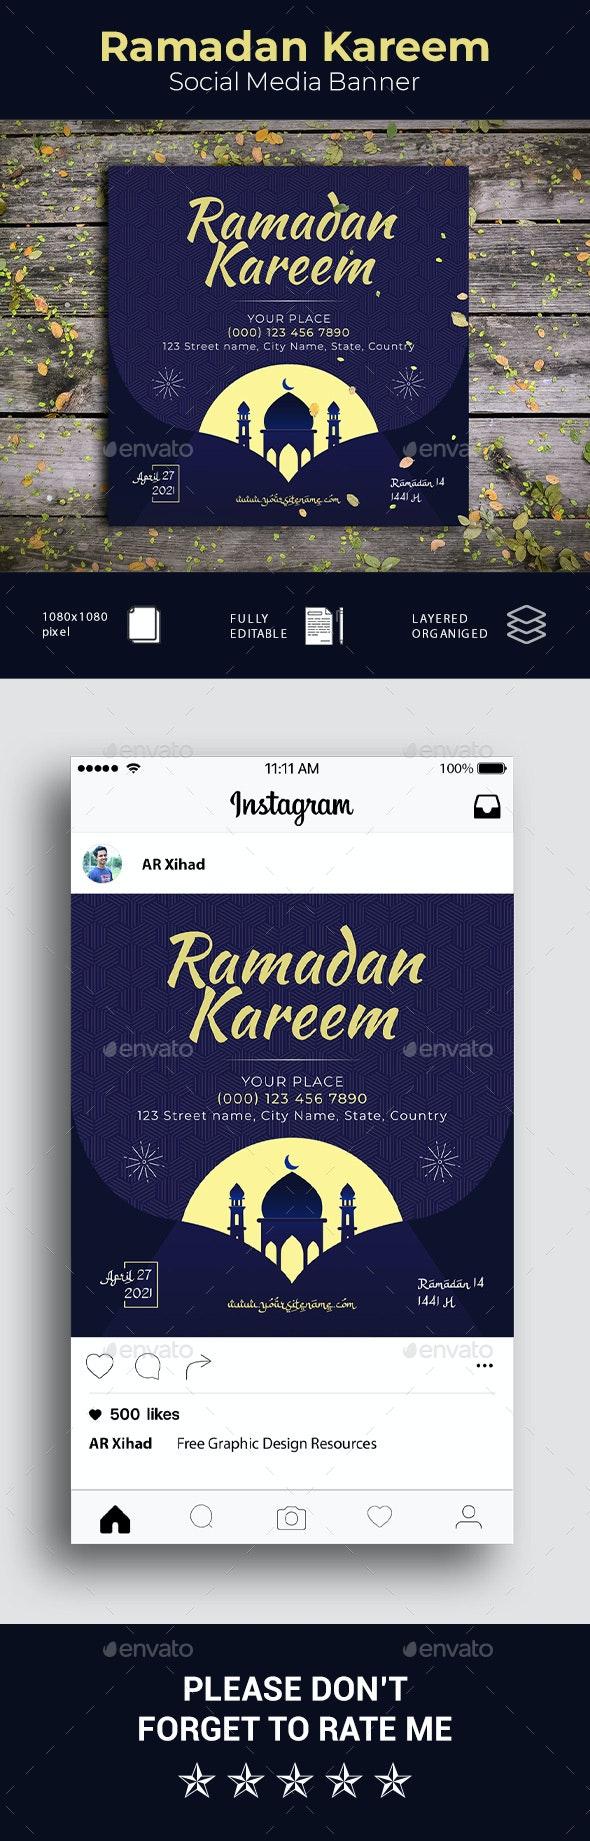 Ramadan Kareem Social Media Banner - Social Media Web Elements